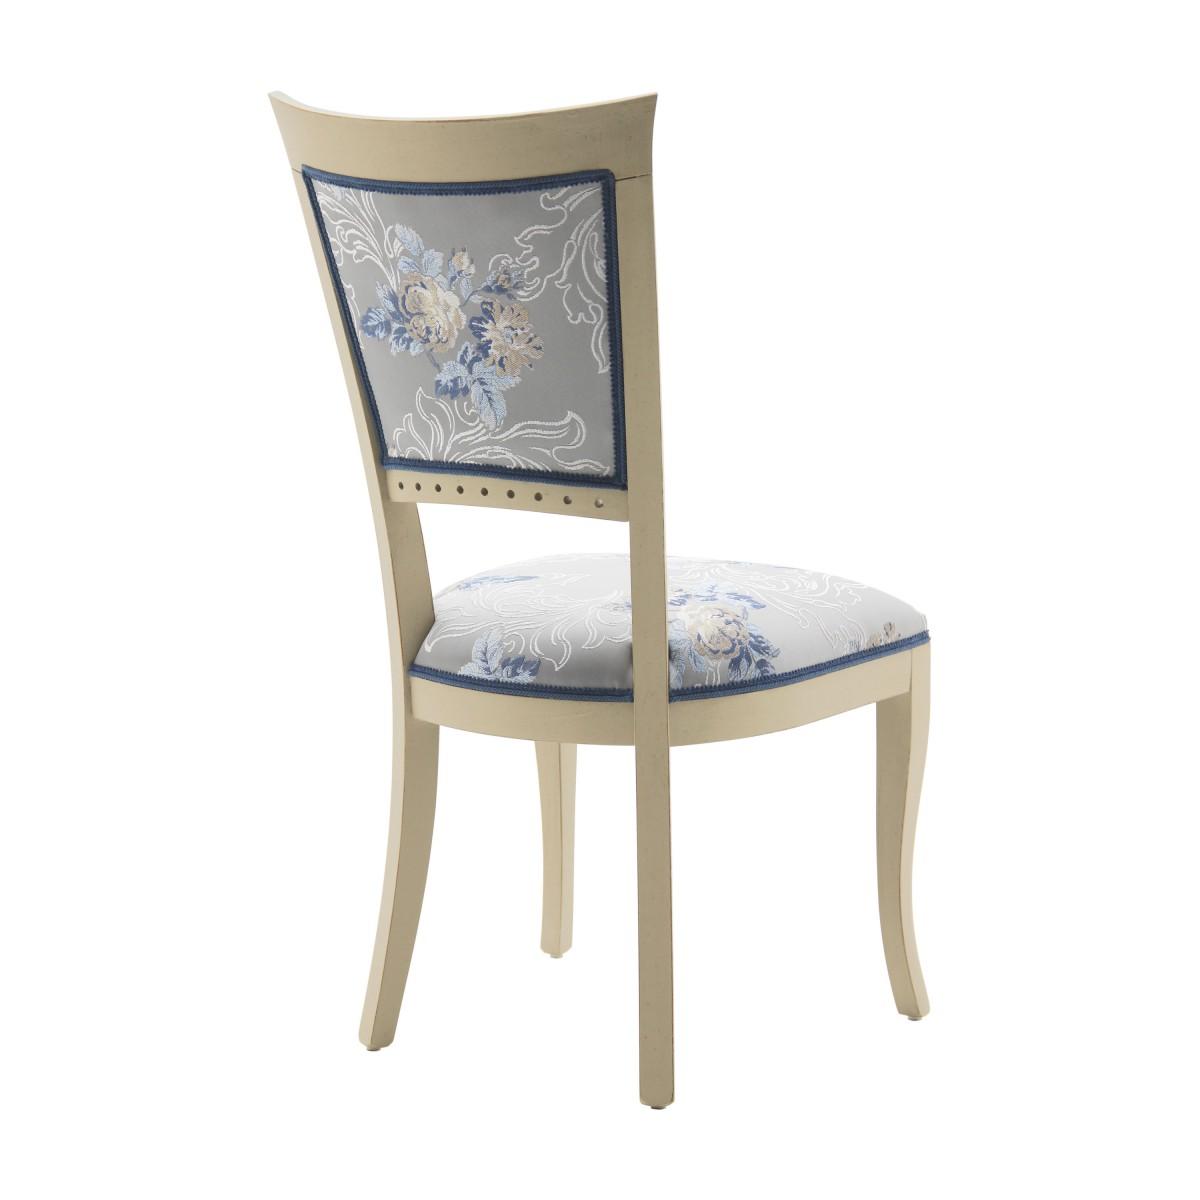 classic chair modigliani 1 6492